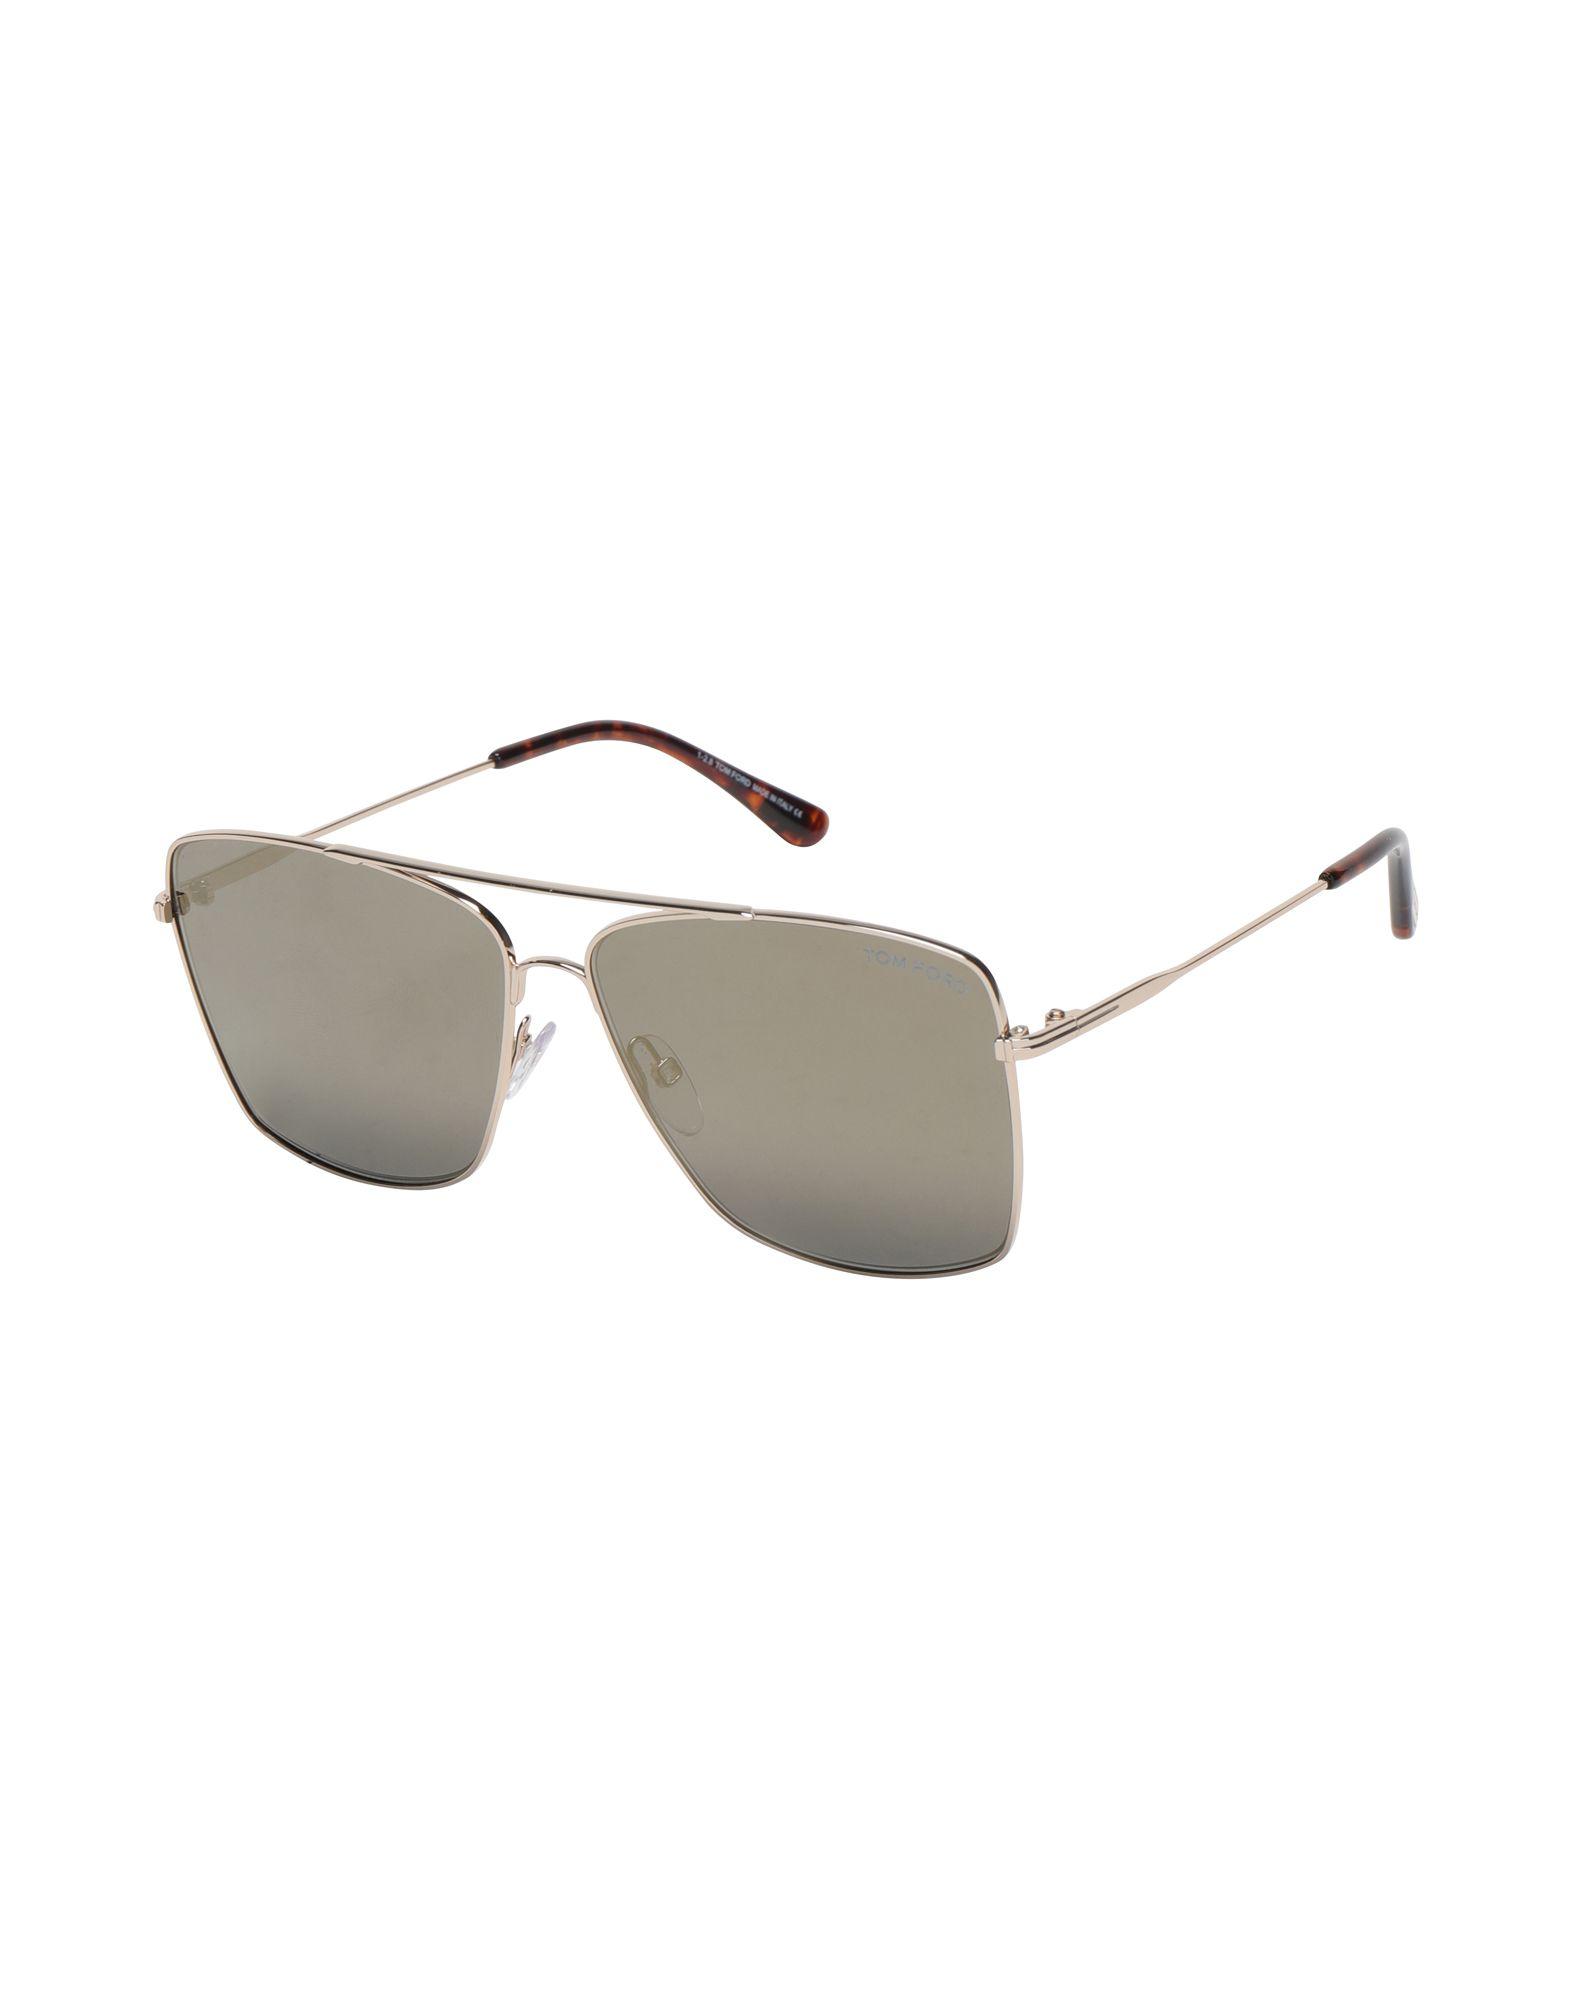 TOM FORD Солнечные очки очки 02 spectrum